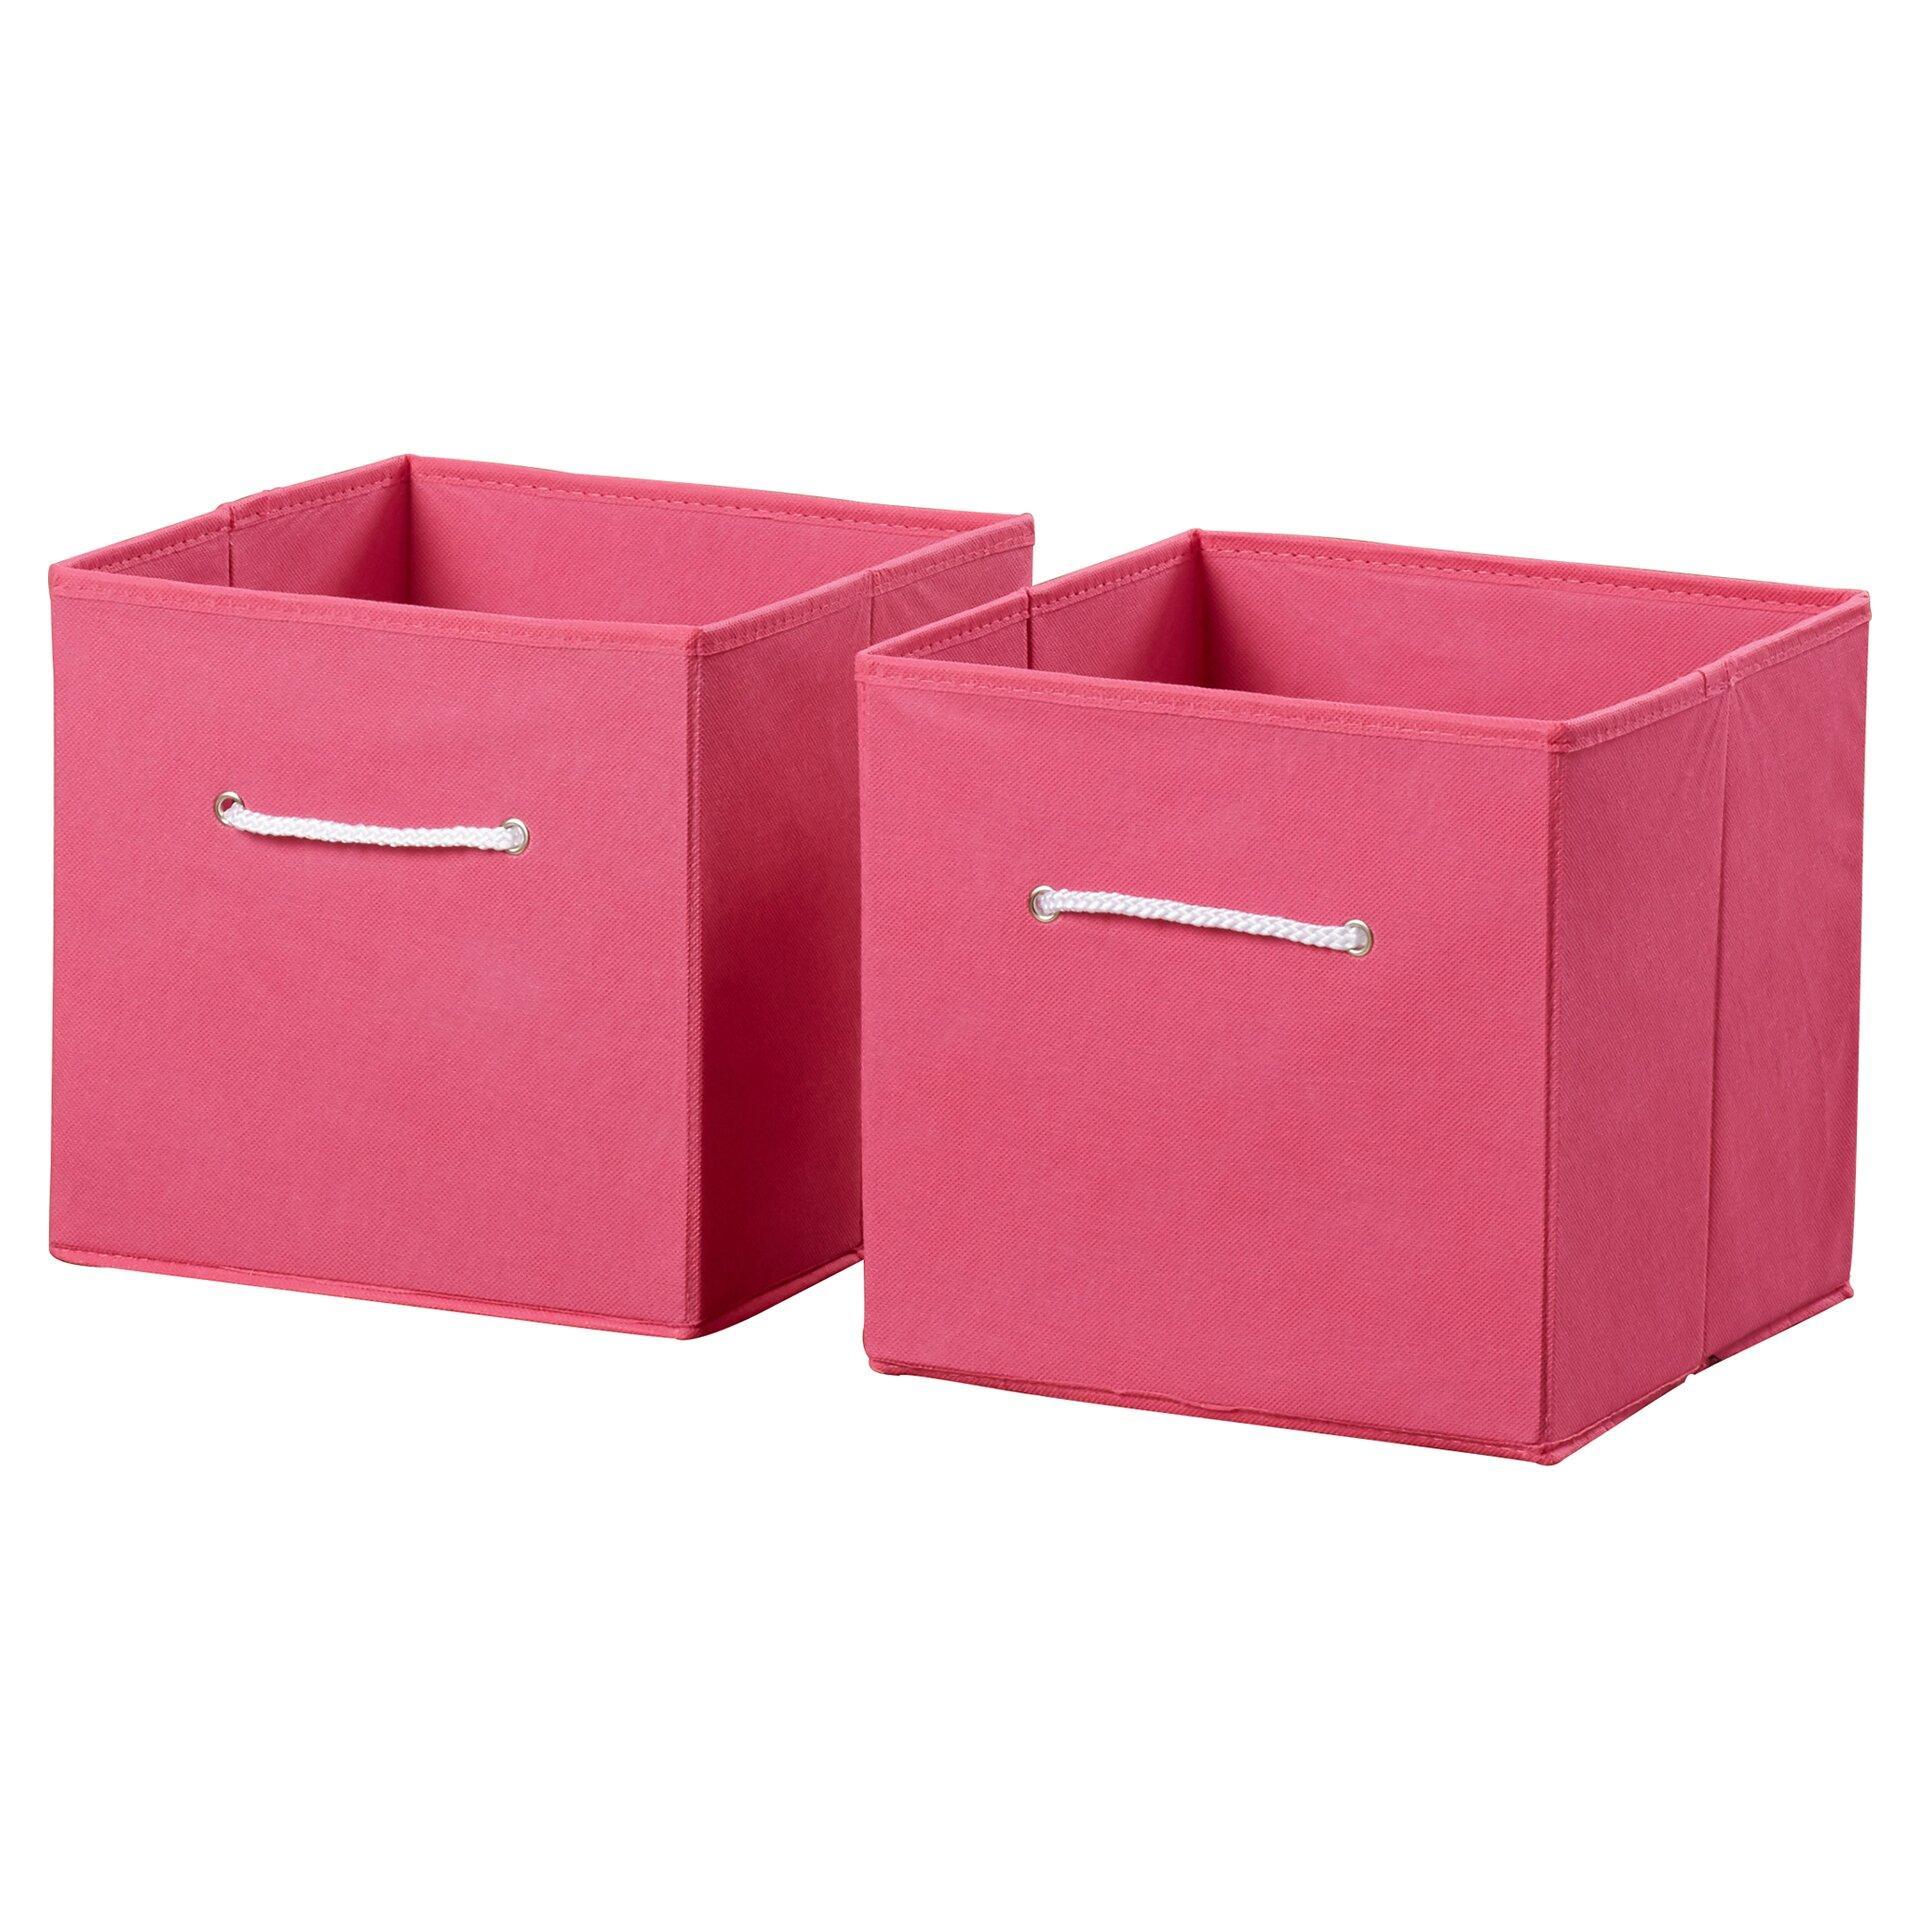 RiverRidge Kids Folding Toy Storage Bins. RiverRidge Kids Folding Toy Storage Bins   Reviews   Wayfair